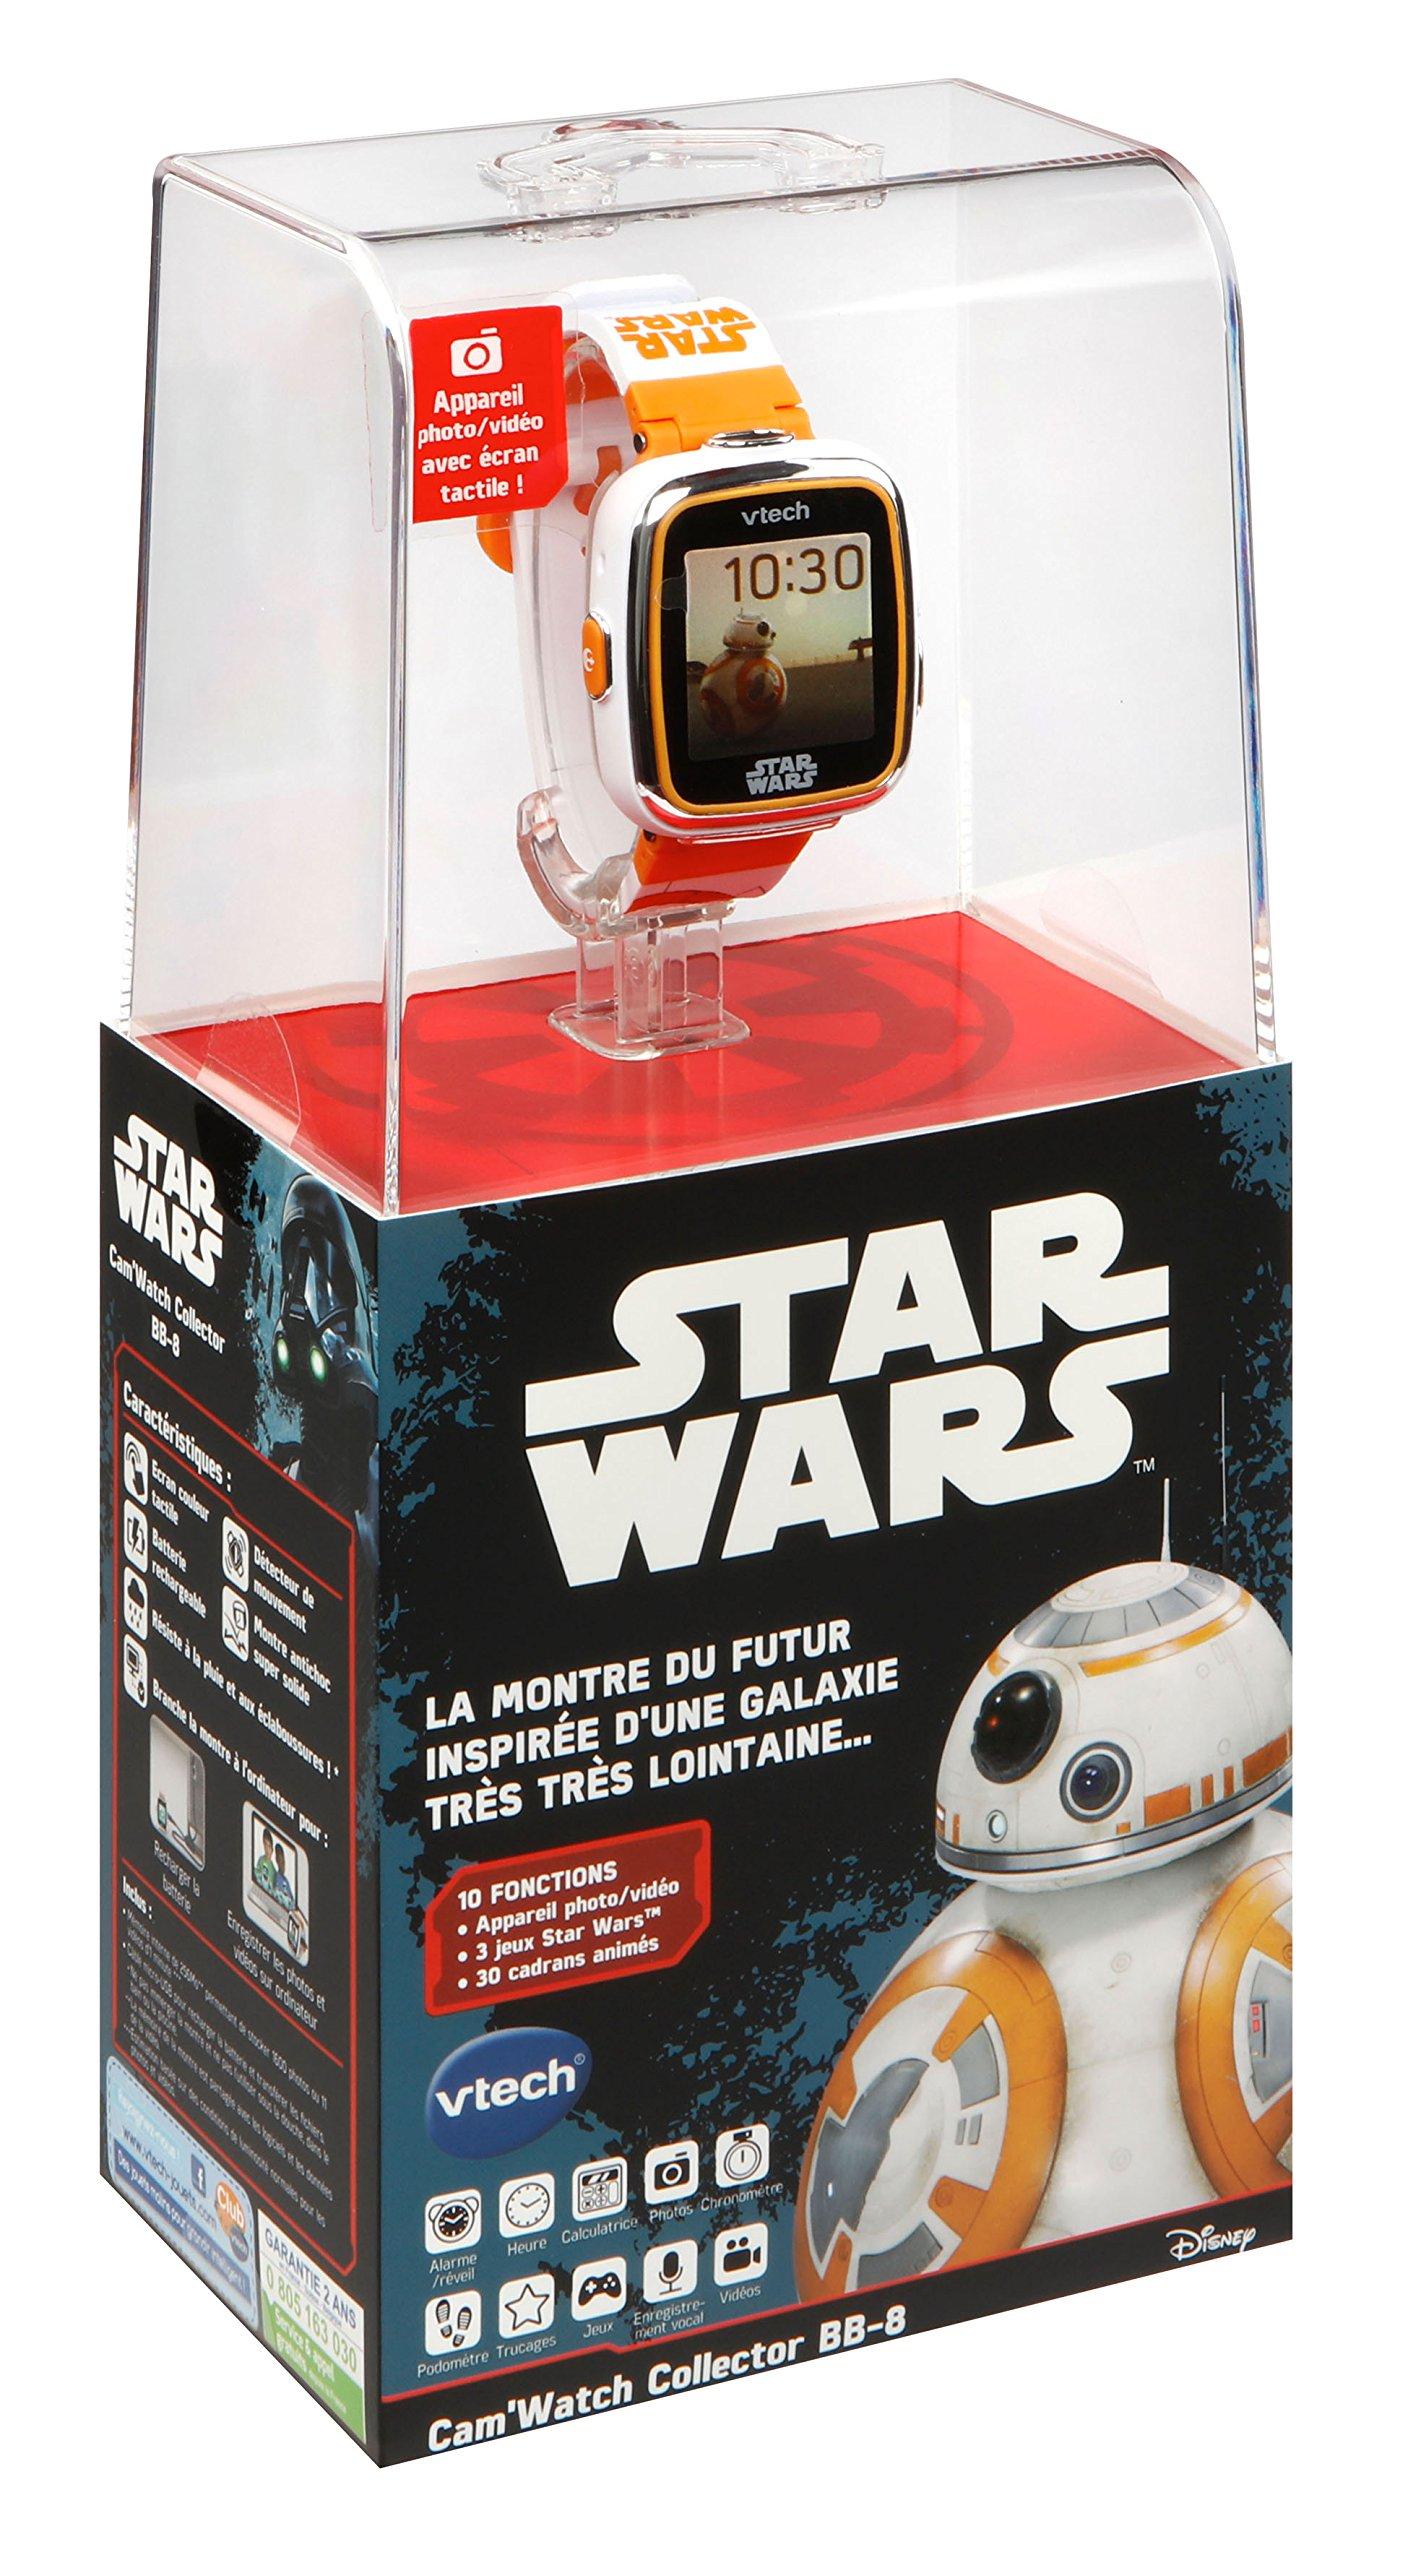 VTech Star Wars – Cam'watch Collector BB8 – Electrónica